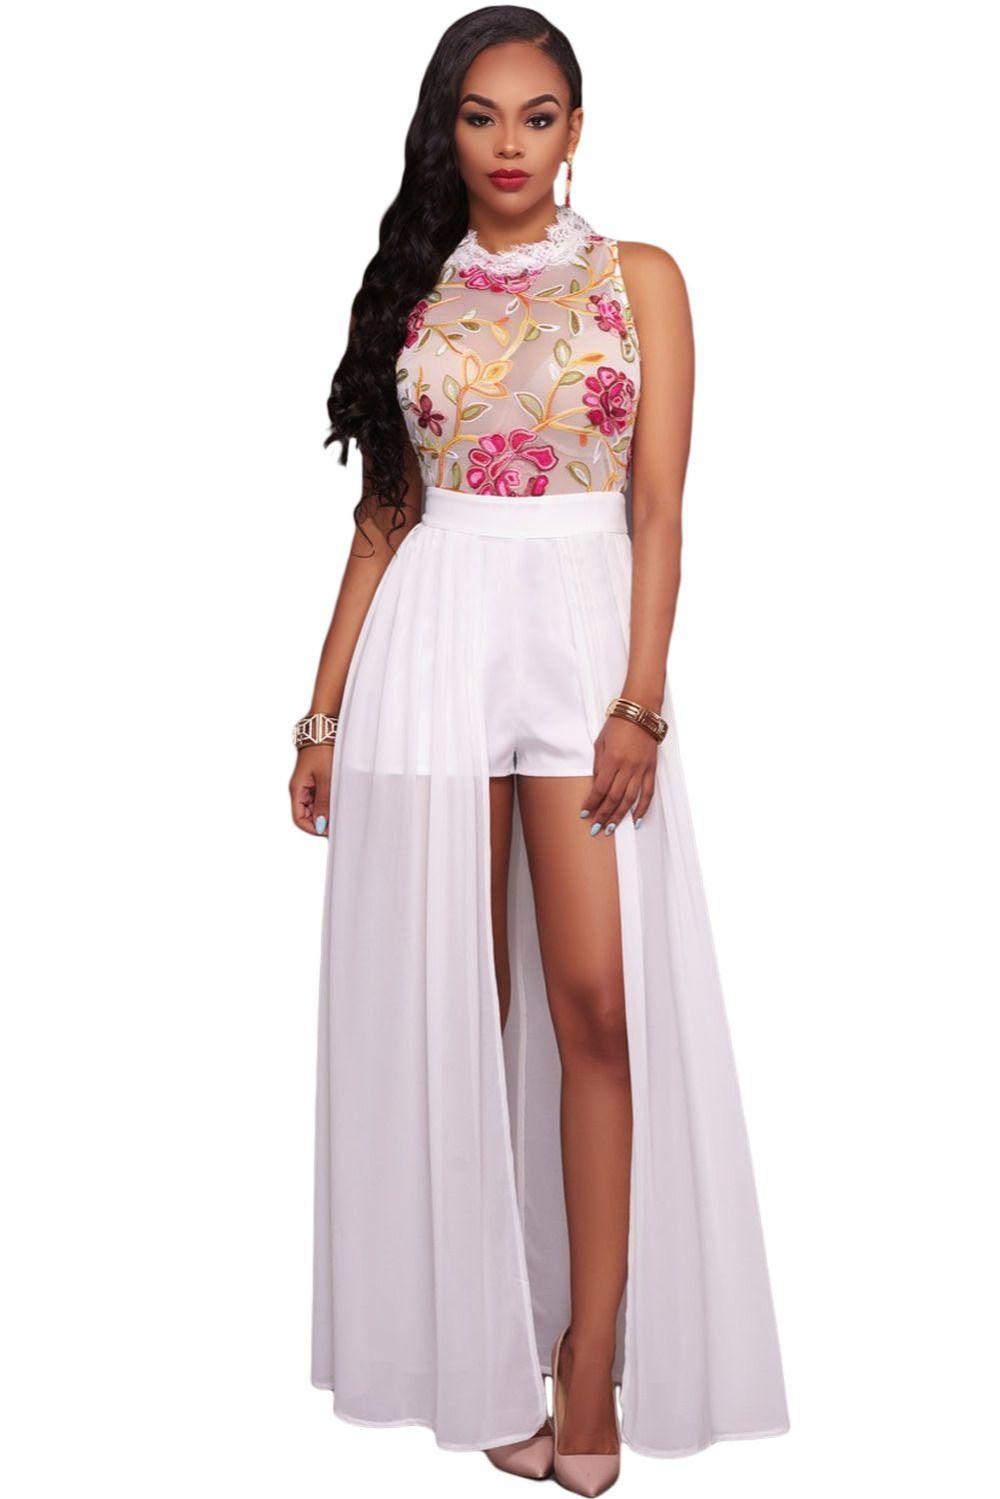 fda9d3bcaff2 2017 Women Summer Celebrity bohemian dinner party Sexy Ladies Bodycon Sheer Mesh  Embroidery Chiffon Romper Maxi